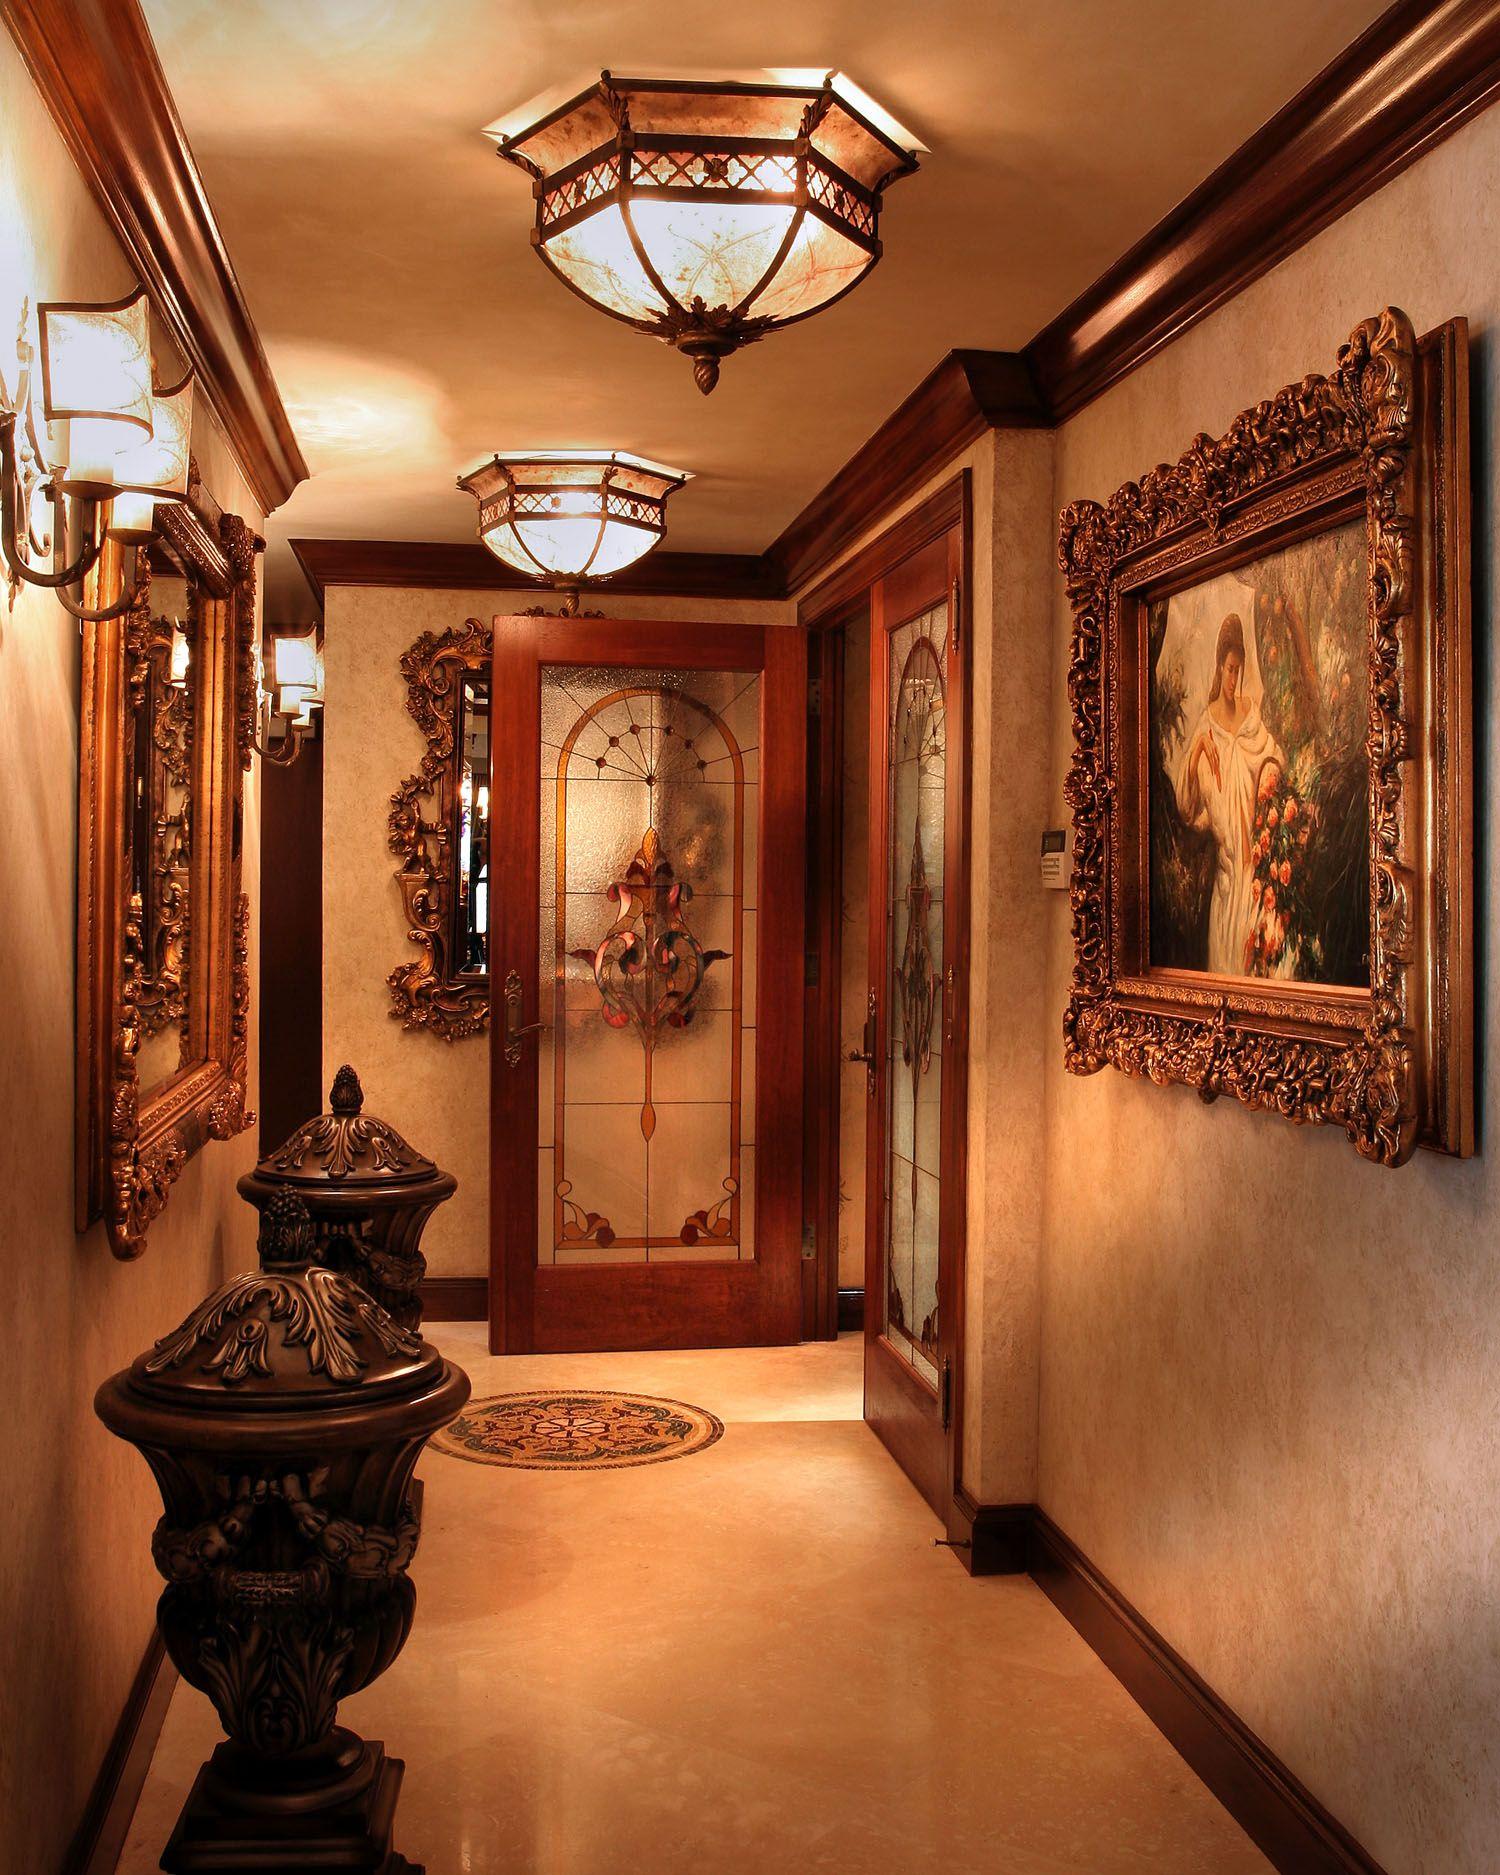 126 Custom Luxury Dining Room Interior Designs: Luxury Hallway Interior Design By Perla Lichi